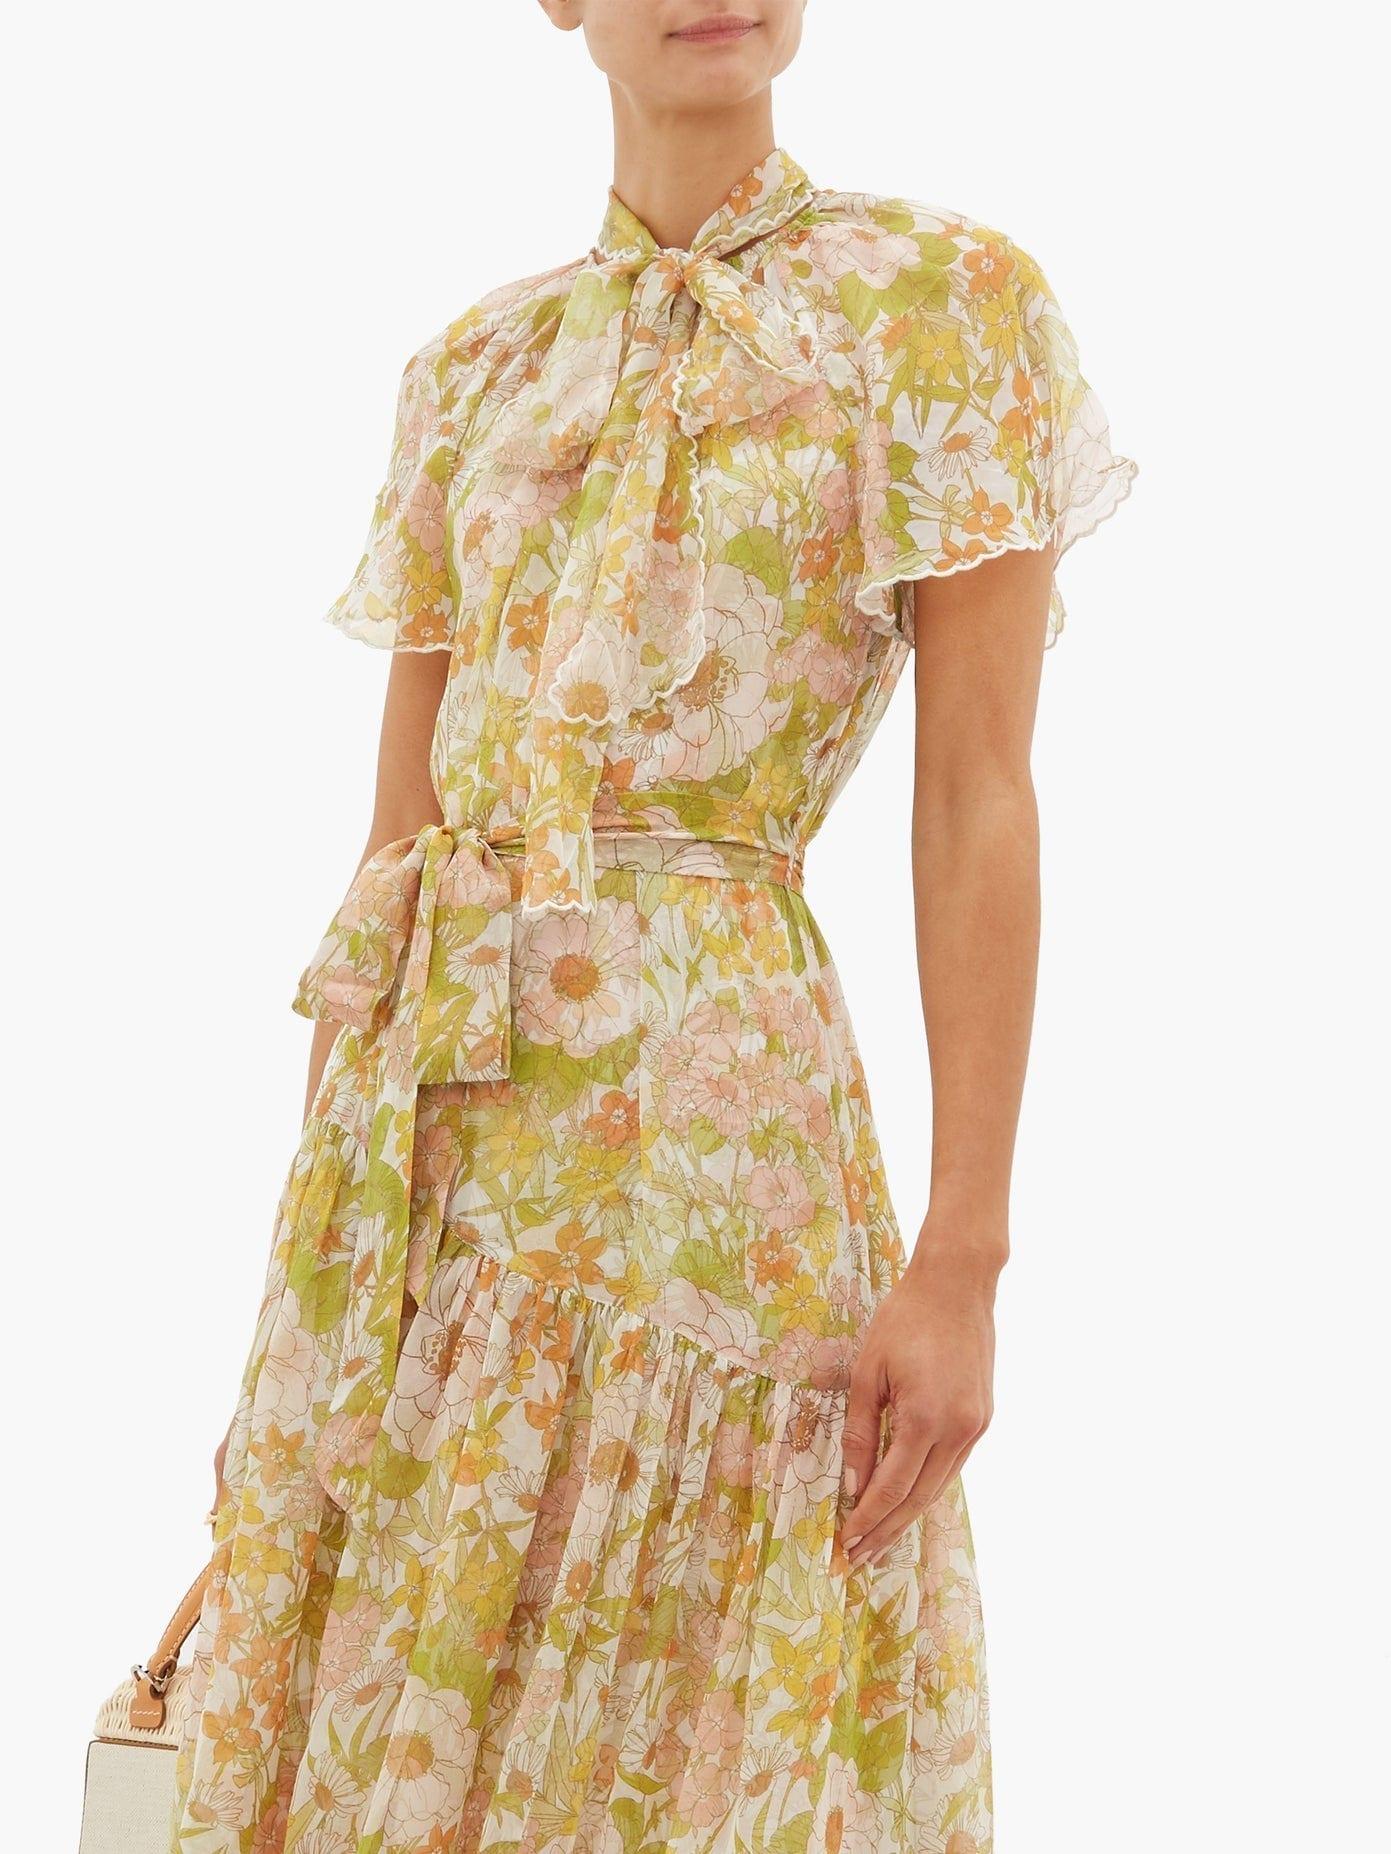 Zimmermann Super Eight Floral Print Silk Chiffon Dress